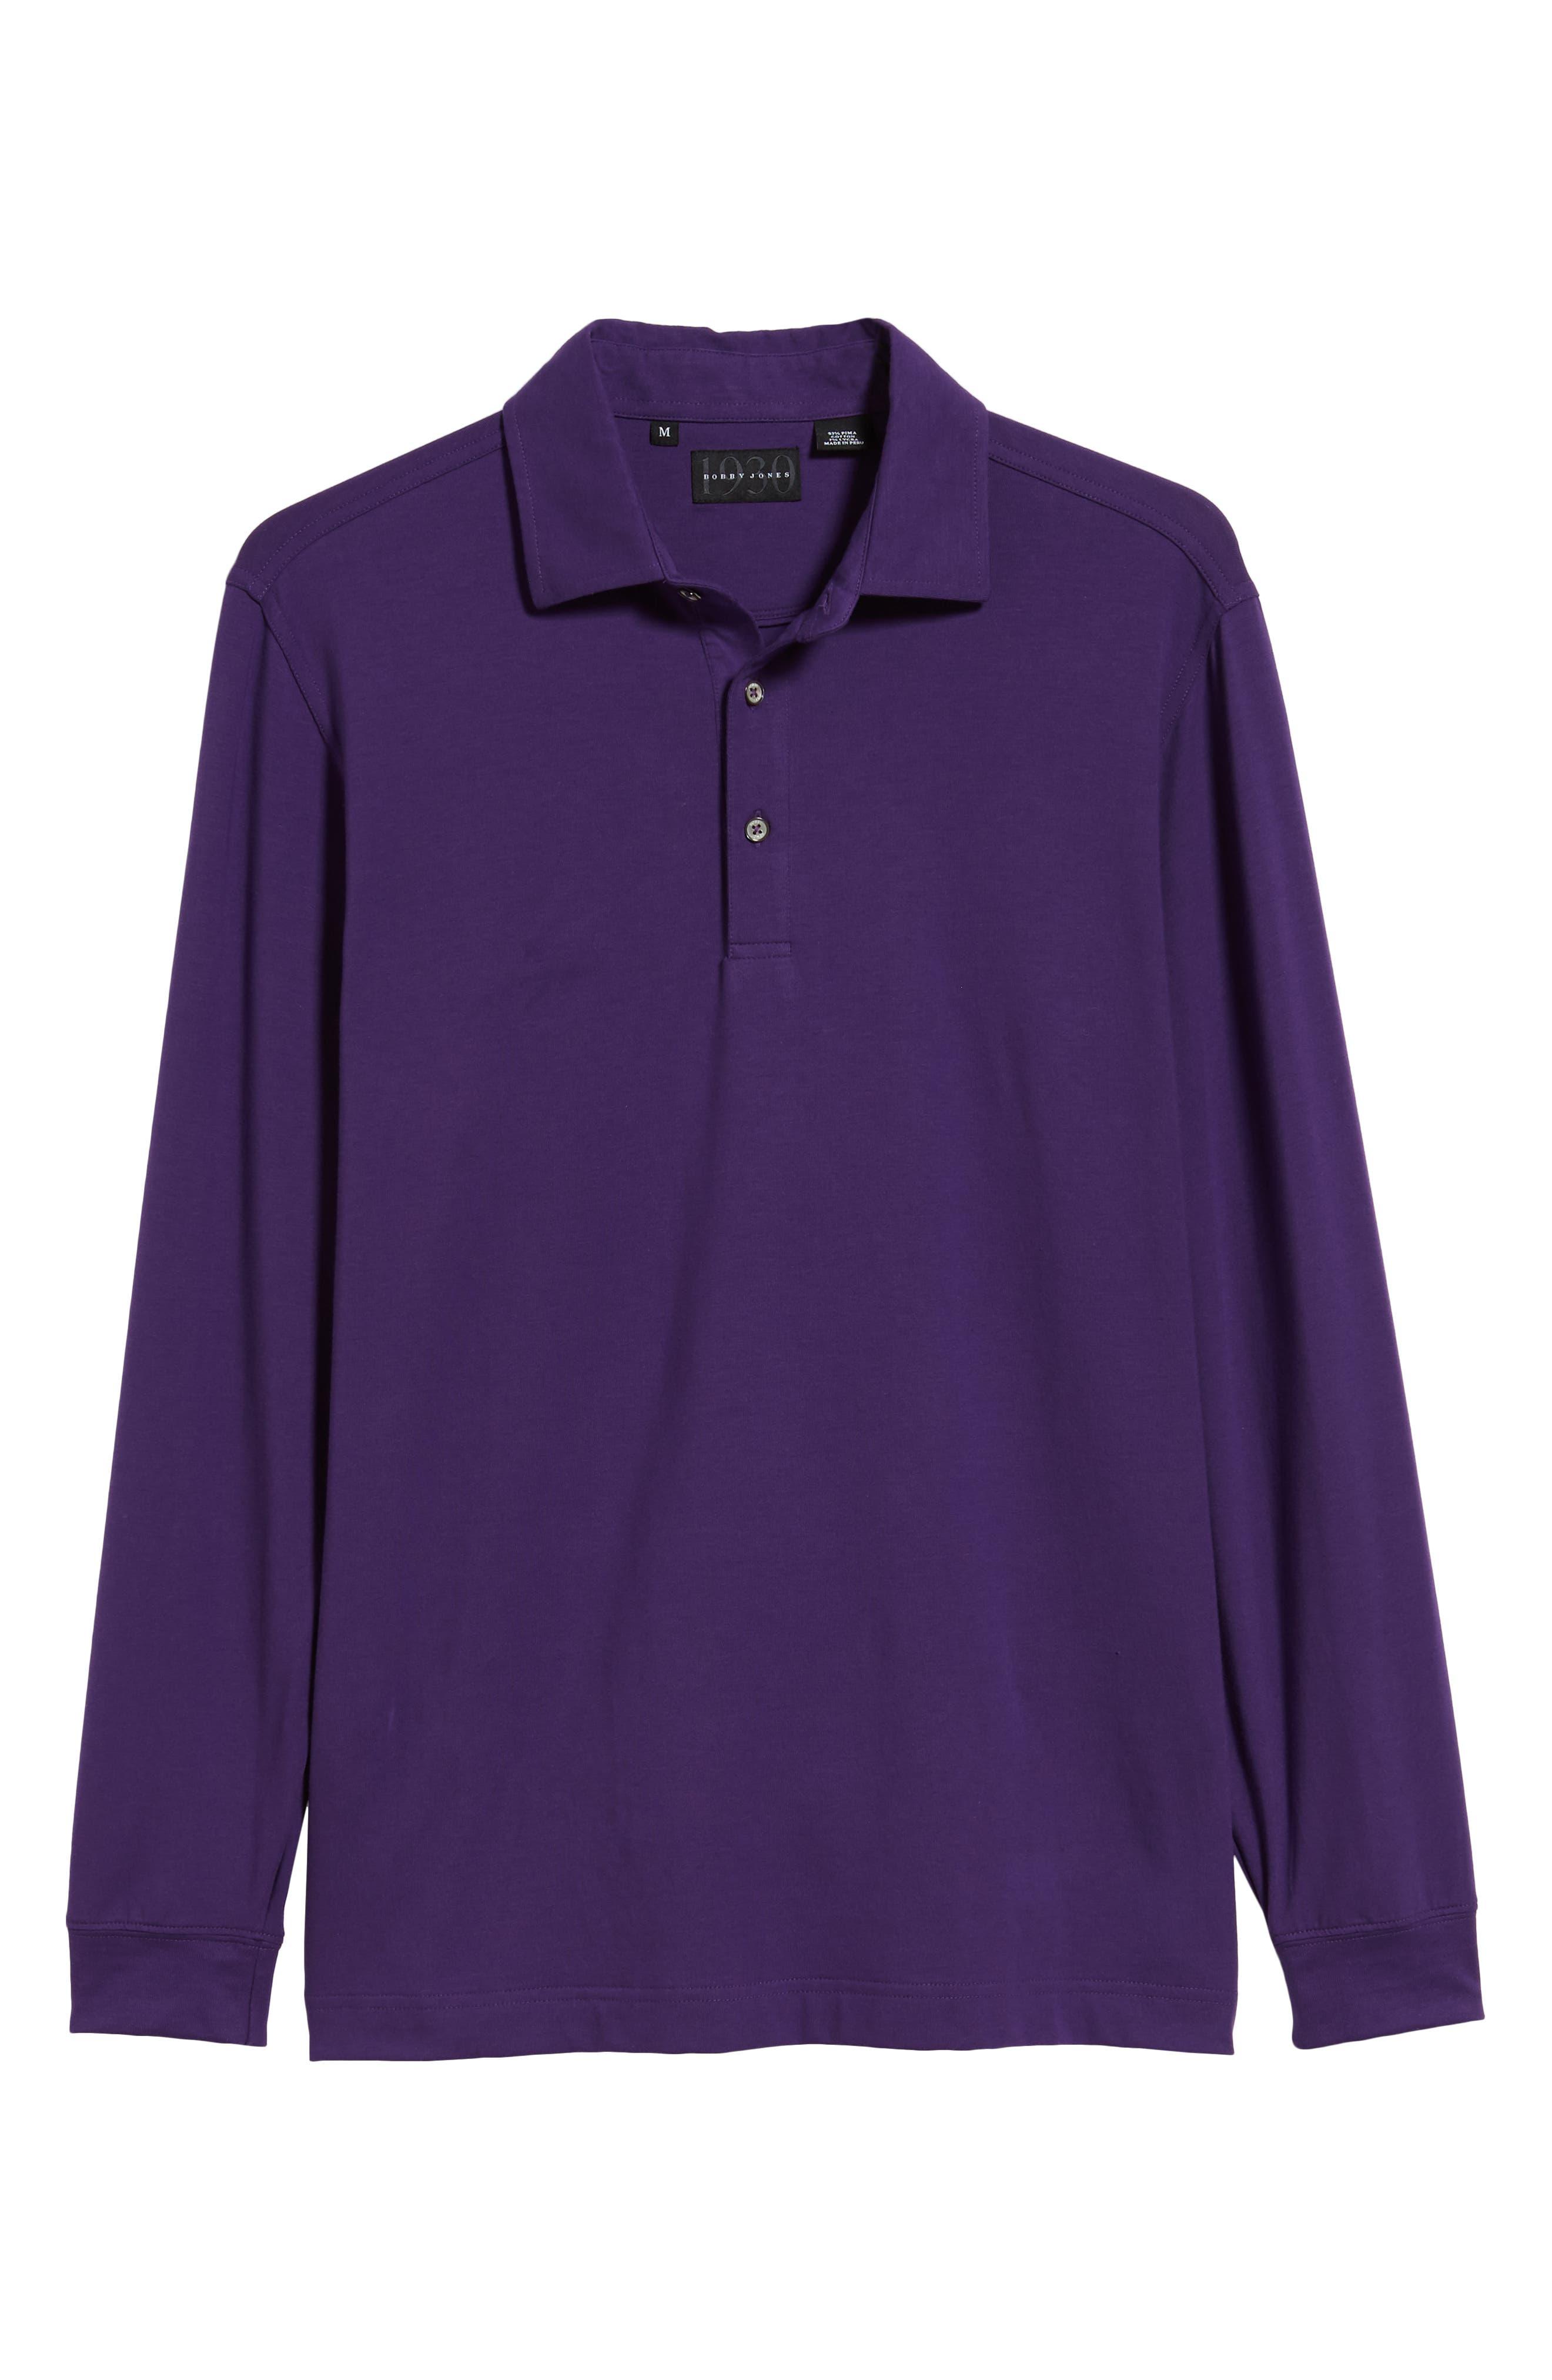 'Liquid Cotton' Long Sleeve Jersey Polo,                             Alternate thumbnail 6, color,                             PURPLE